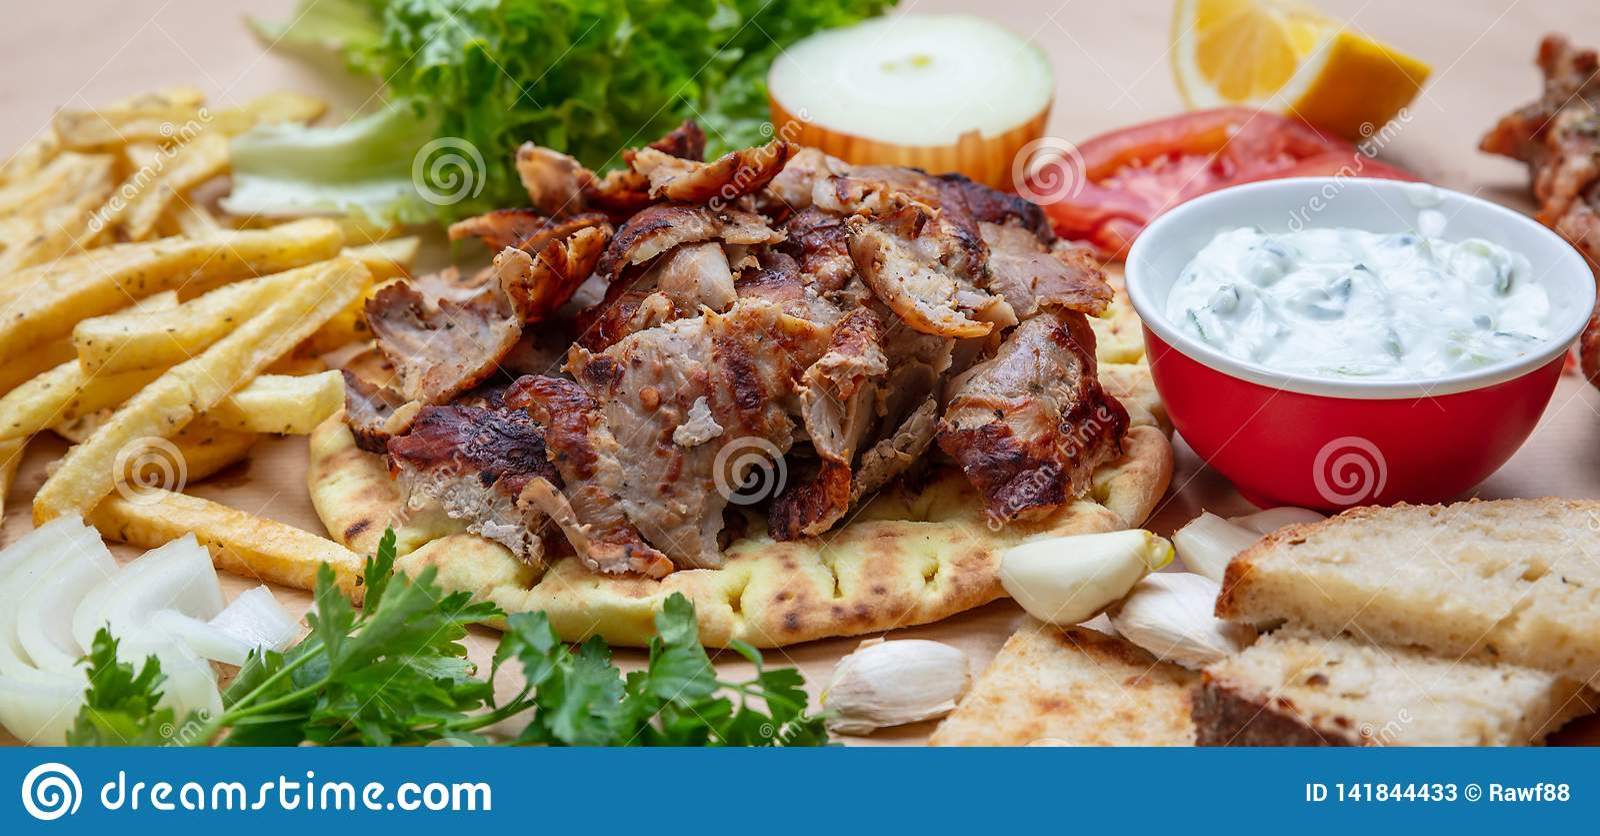 Gyros pita, Shawarma. Traditional greek, turkish meat food on pita bread and tzatziki, banner